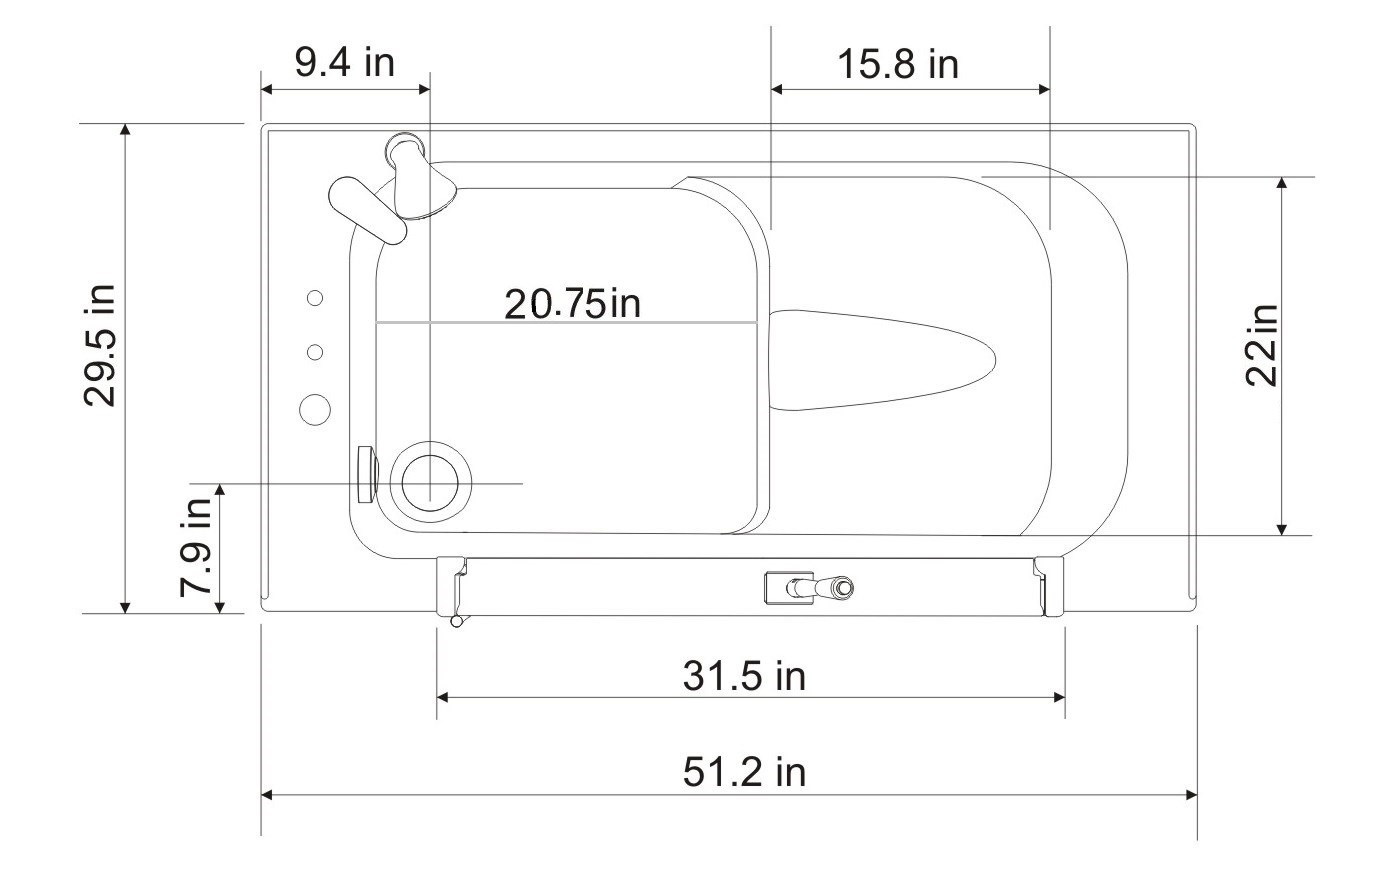 HY41X Top View Diagram